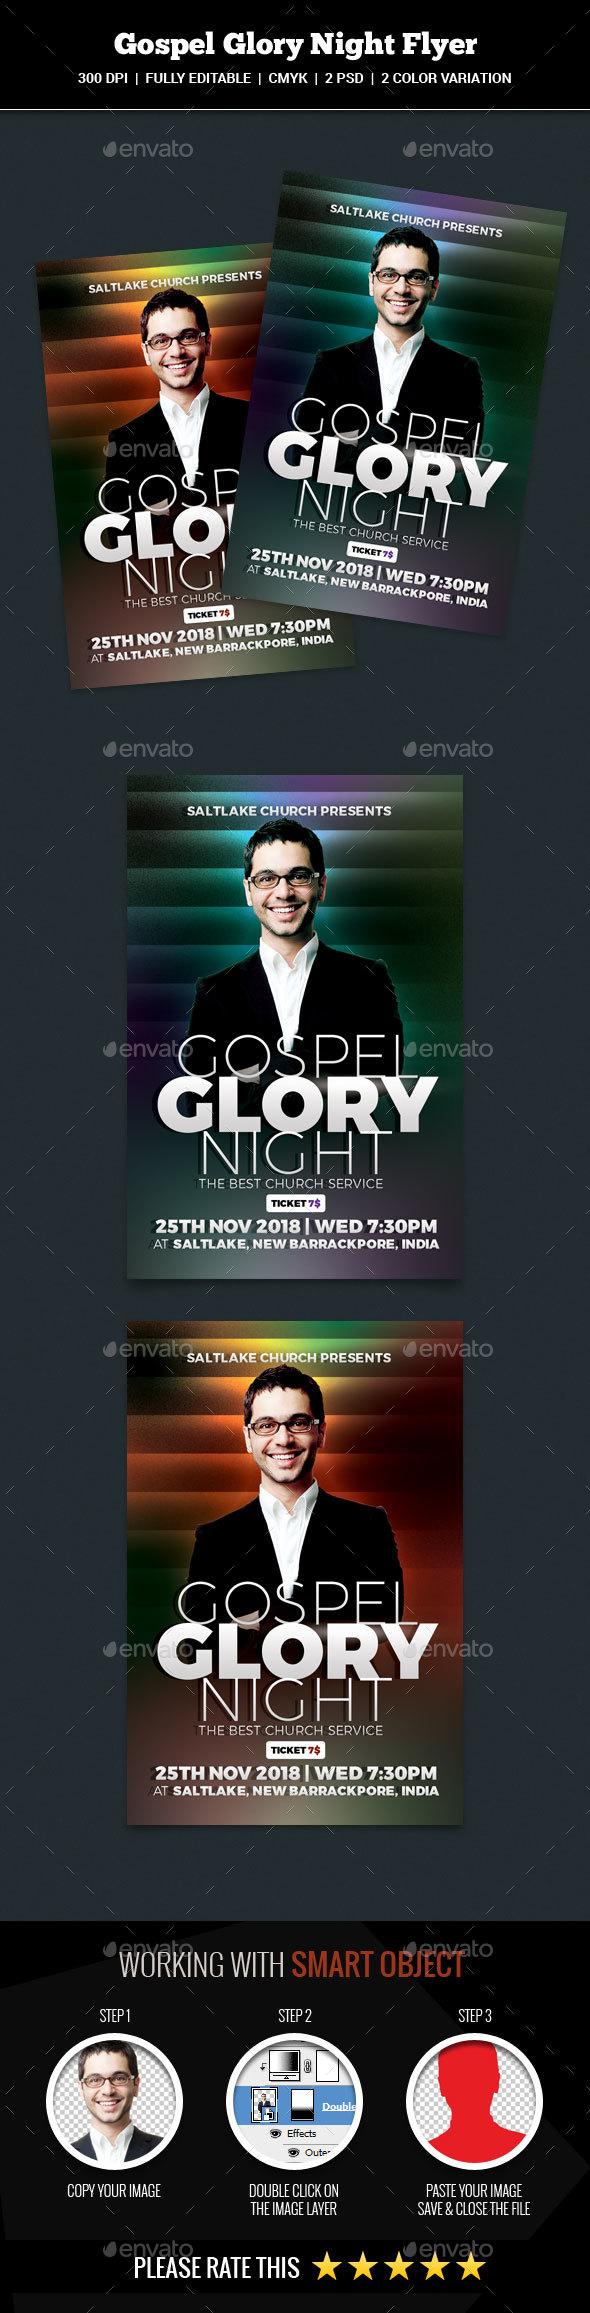 Gospel Glory Night Flyer - Church Flyers